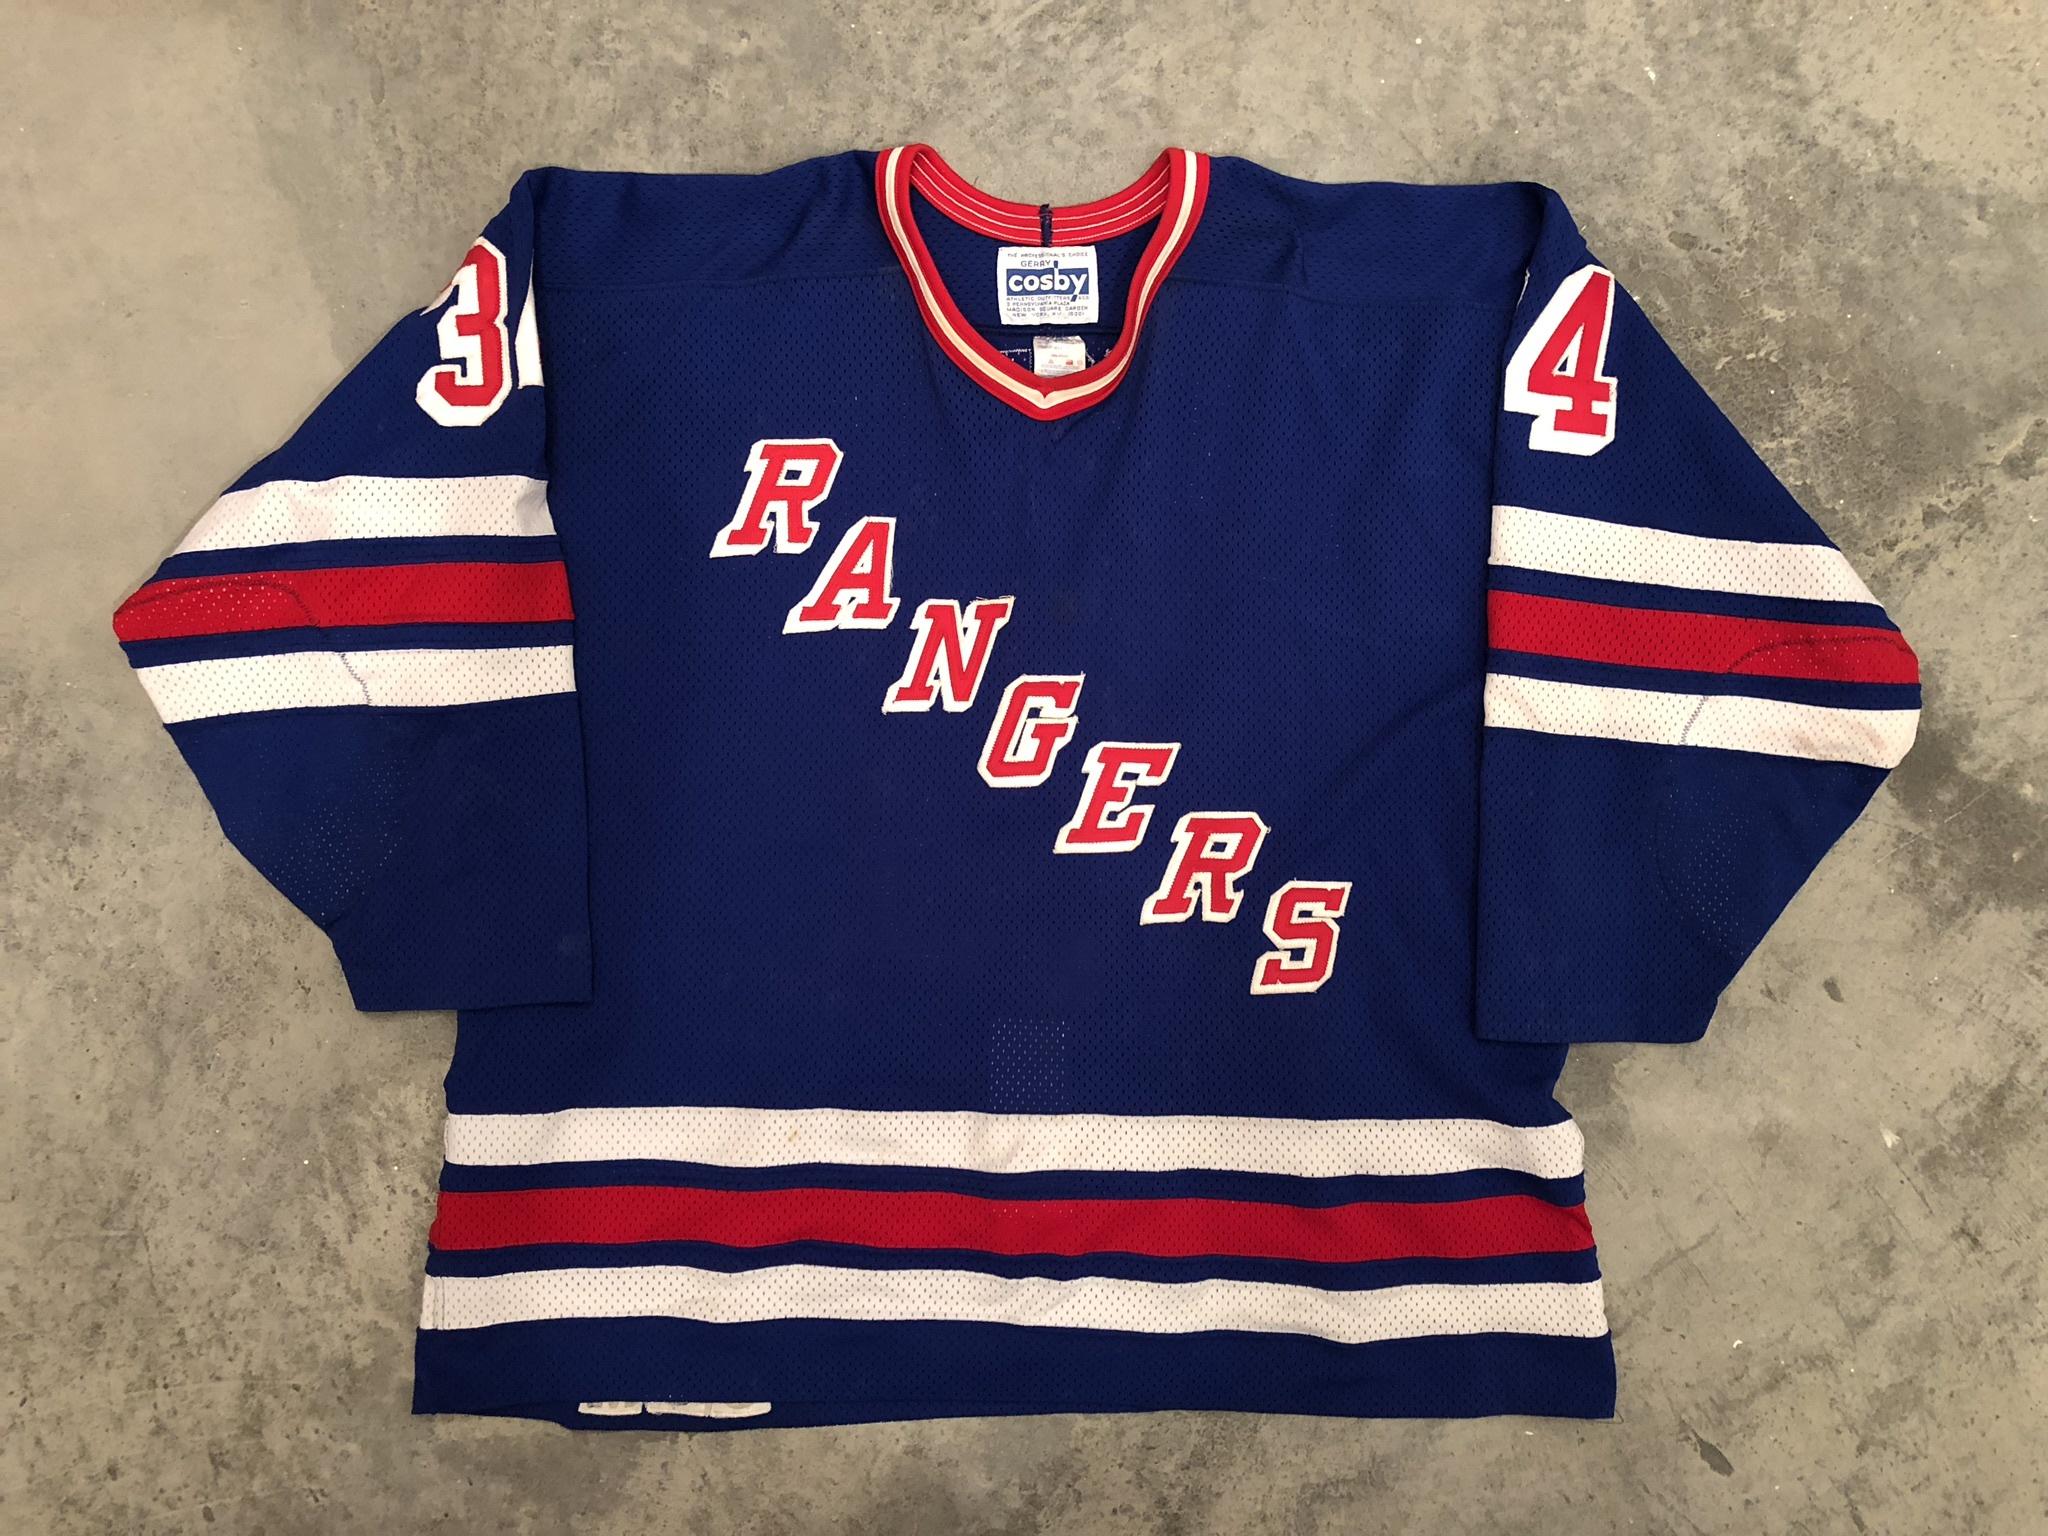 1987-88 New York Rangers game worn road jersey